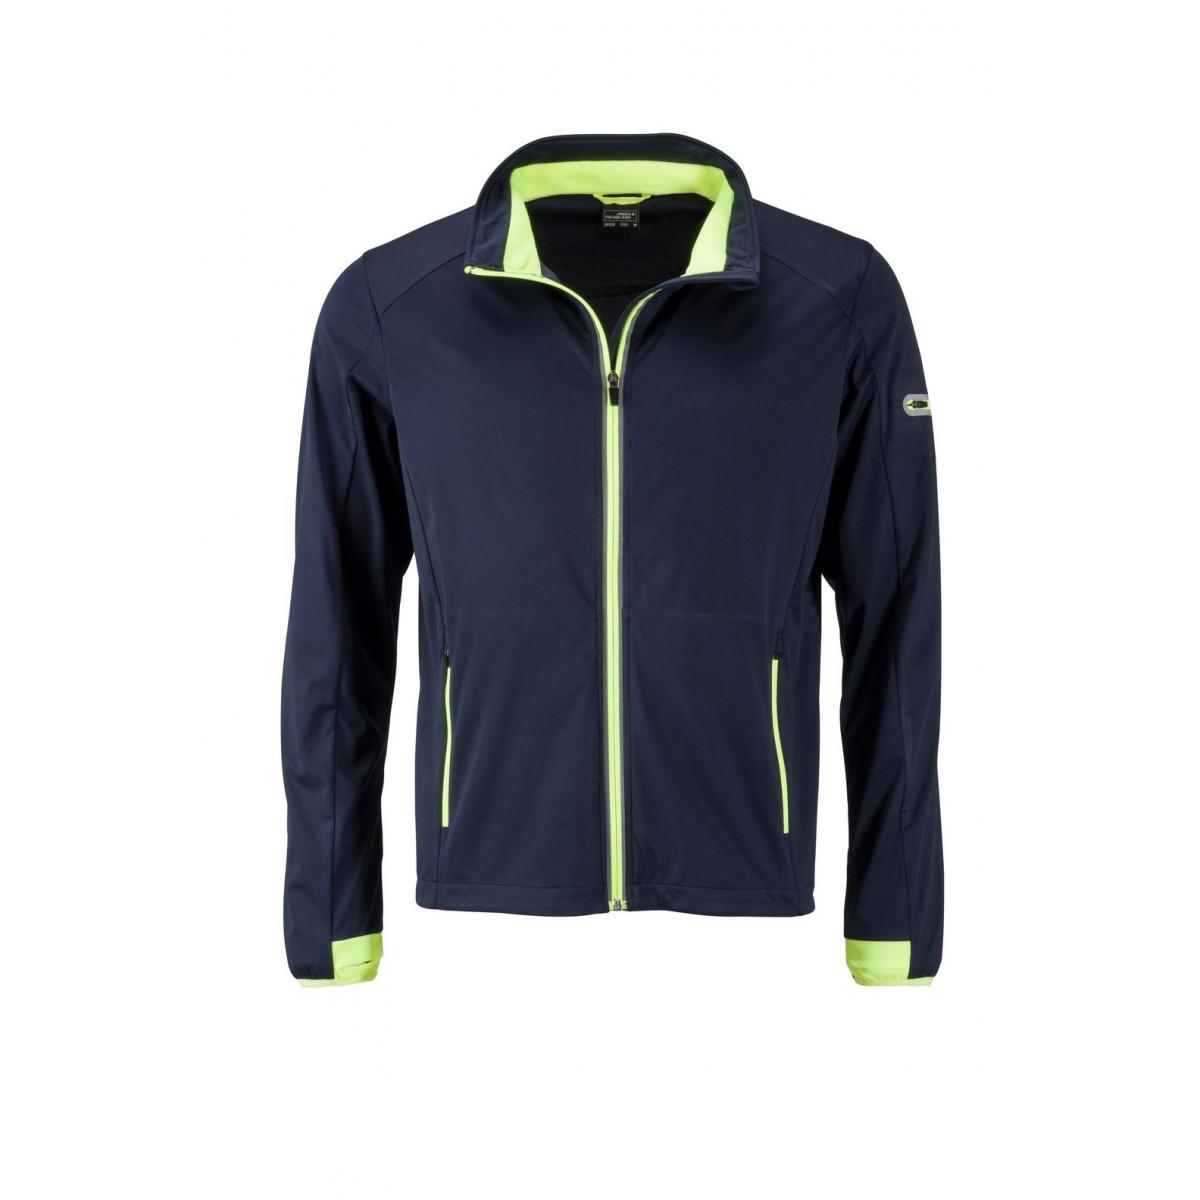 Куртка мужская JN1126 Mens Sports Softshell Jacket - Темно-синий/Ярко-желтый